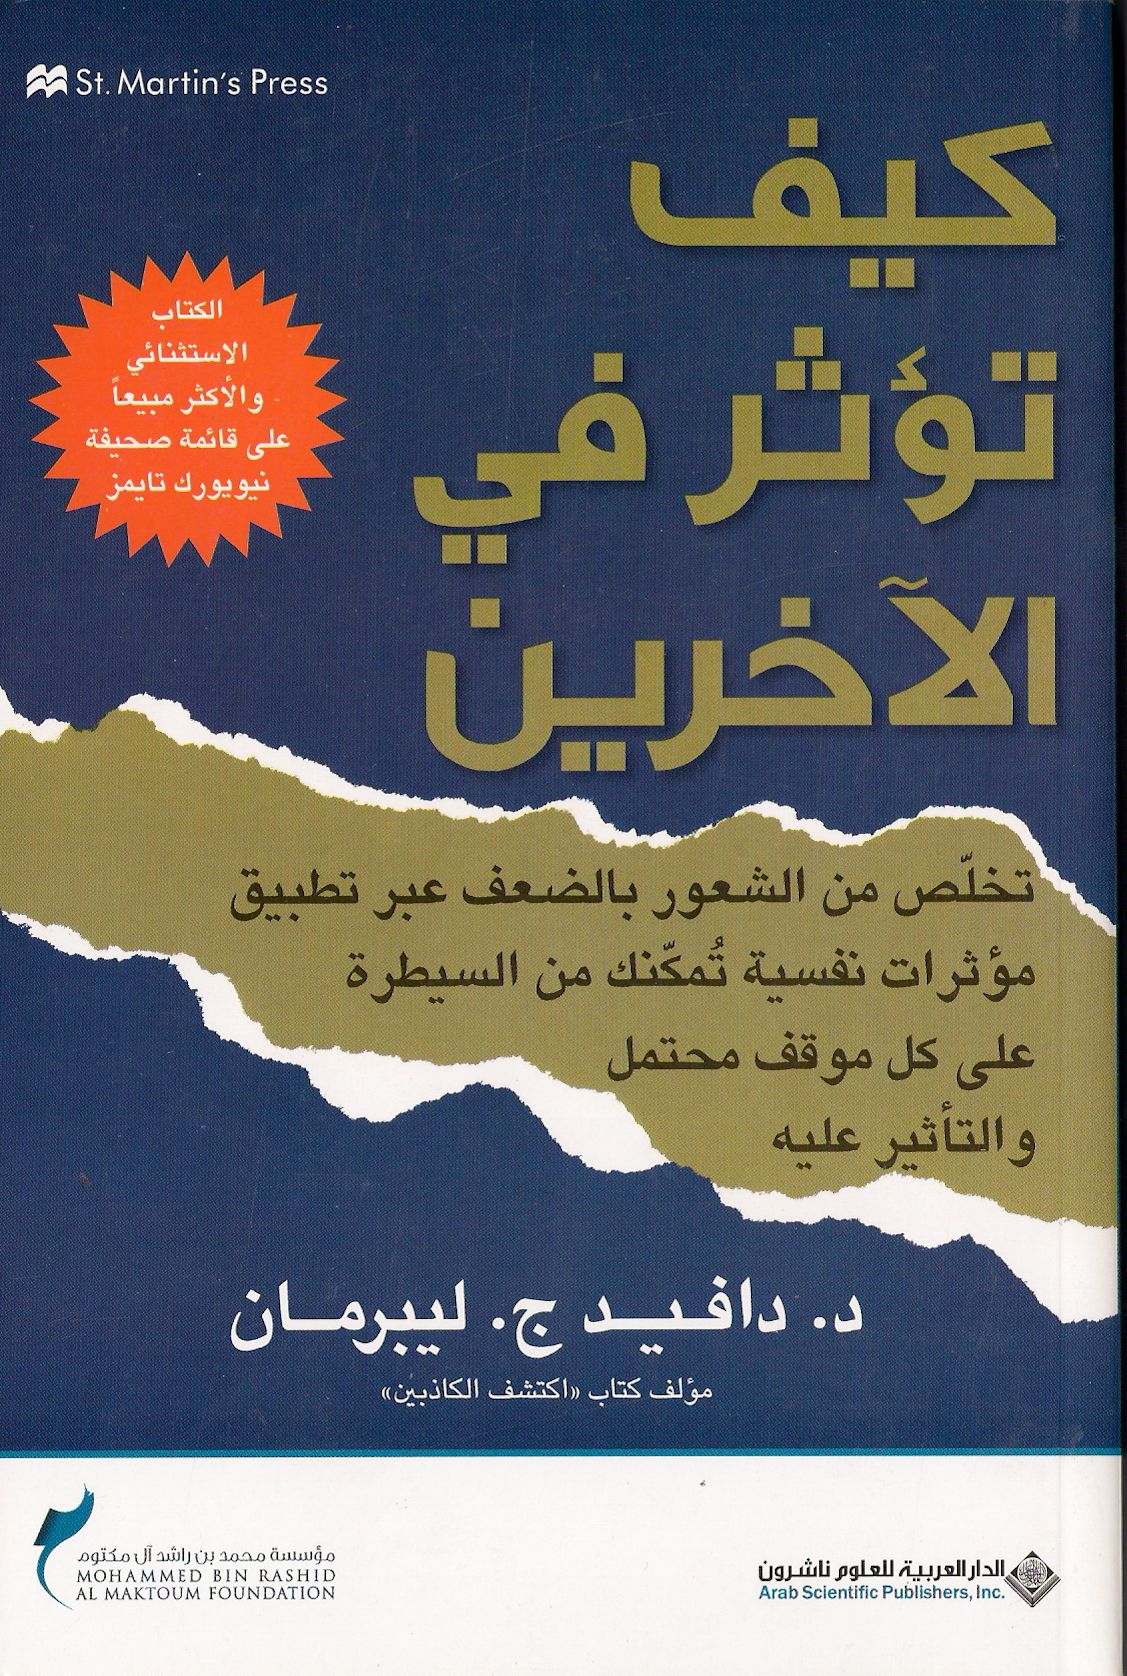 Pin By Hamid Djeffal On أفضل ما قرأت فى علم الاتصال وتحليل الأنماط البشرية Arabic Books Pdf Books Reading Ebooks Free Books